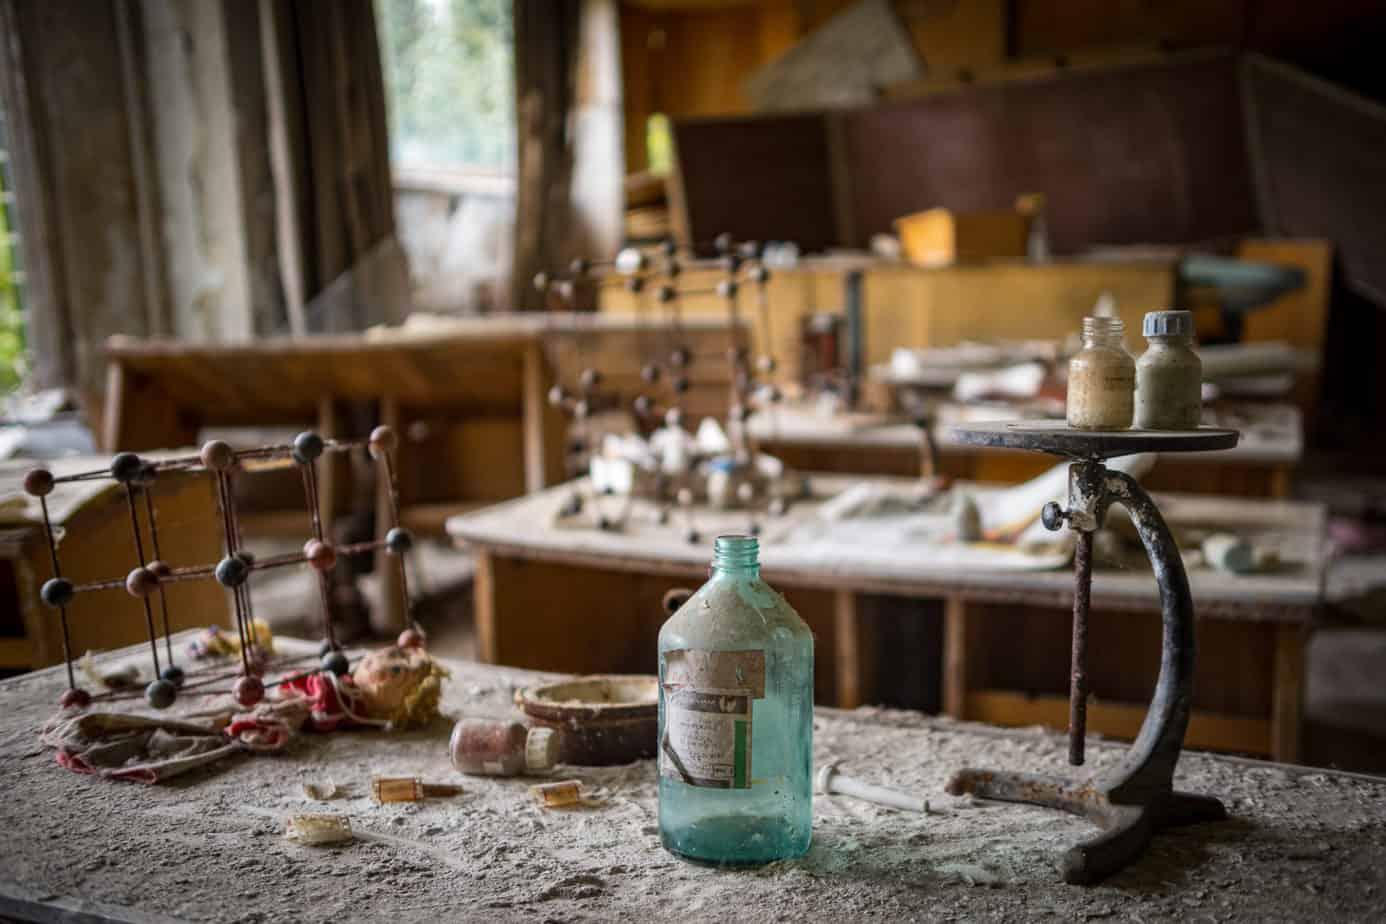 Schule in Tschernobyl